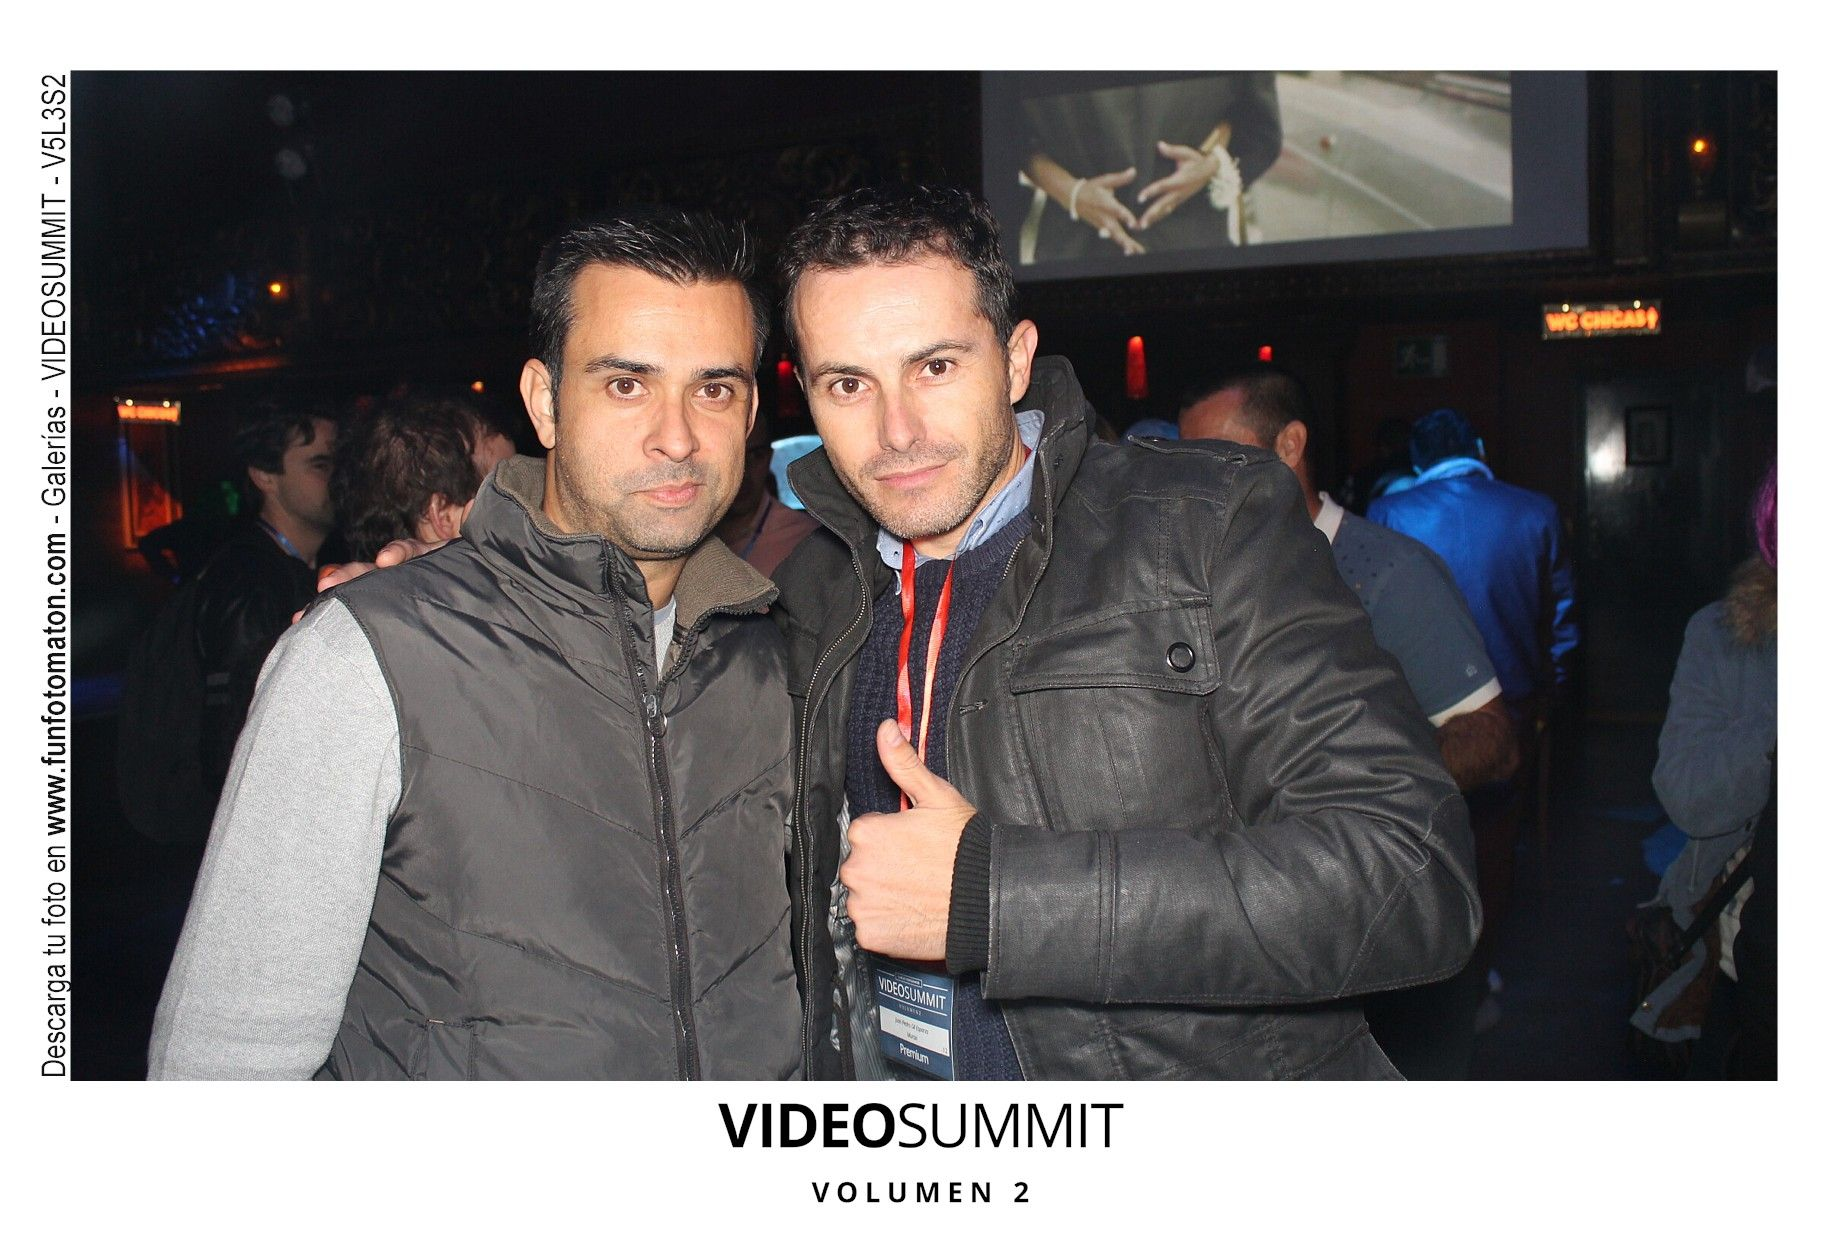 videosummit-vol2-club-party-015